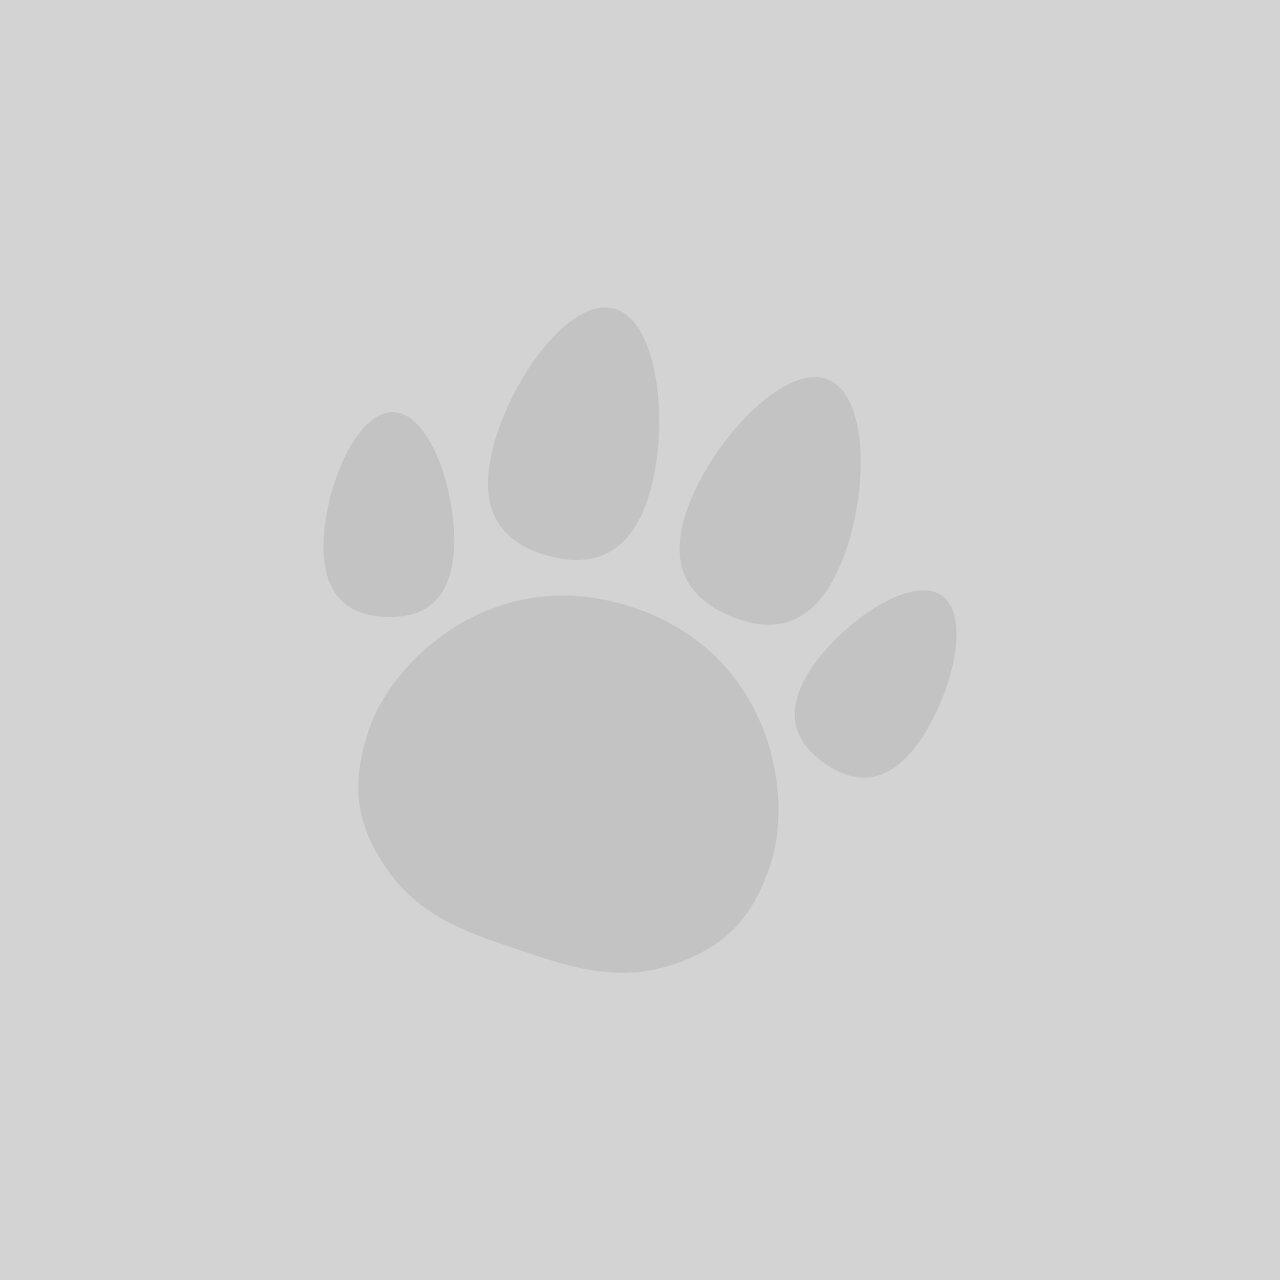 K9 Optimum Puppy Large Breed Chicken (2 Size Options)